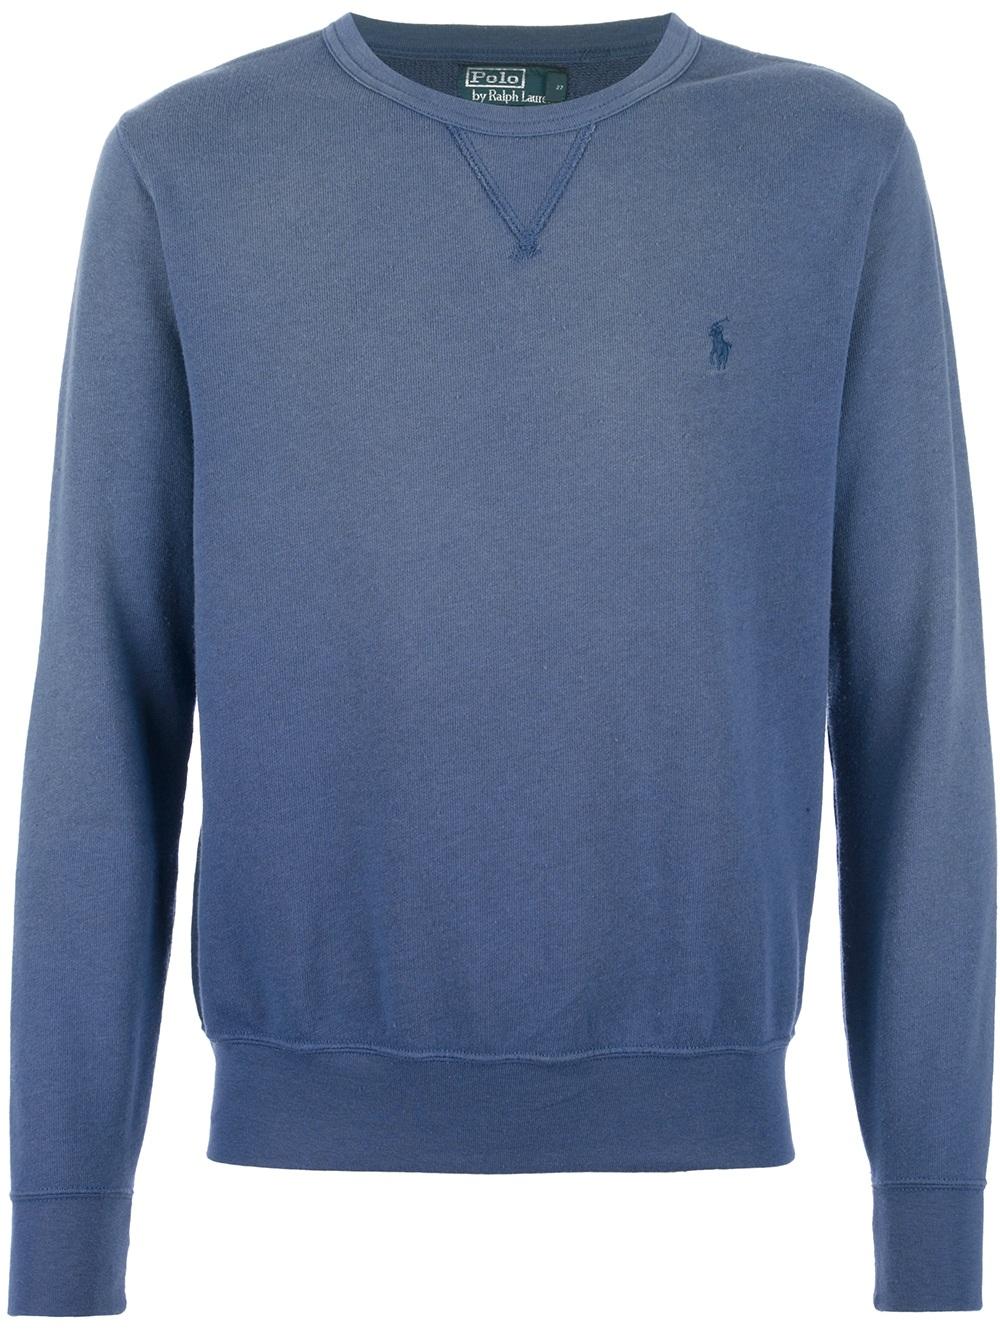 polo ralph lauren washed effect sweatshirt in blue for men. Black Bedroom Furniture Sets. Home Design Ideas